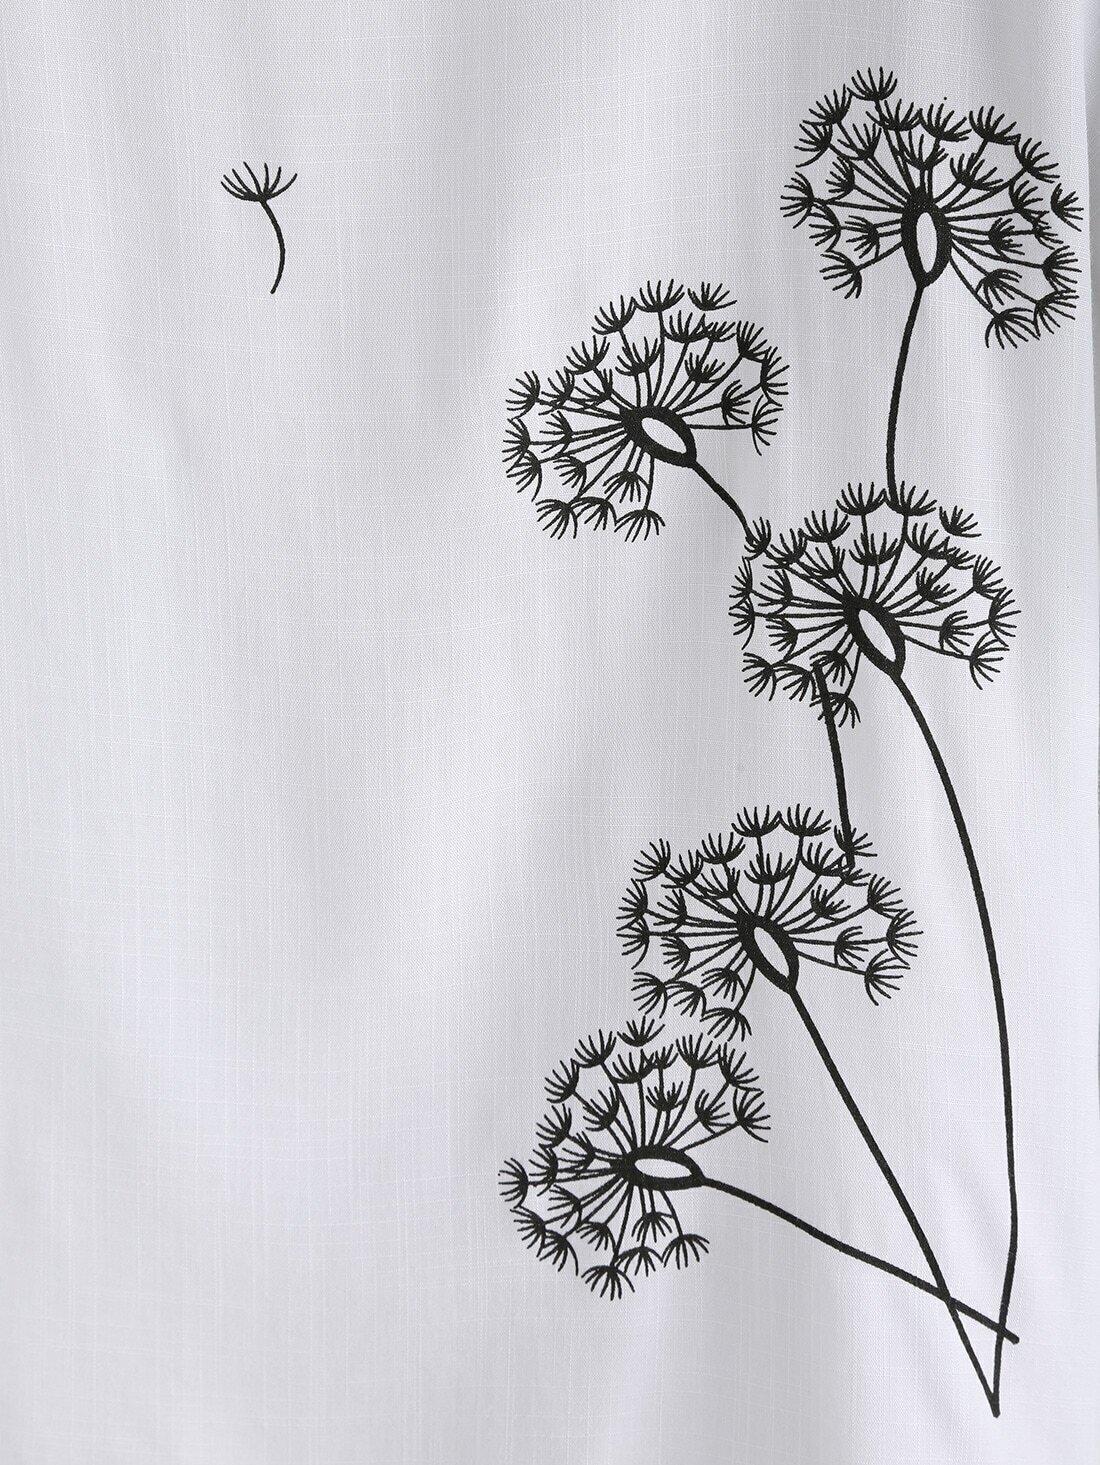 8ce28e3f65 Dandelion Print Linen T-shirt EmmaCloth-Women Fast Fashion Online